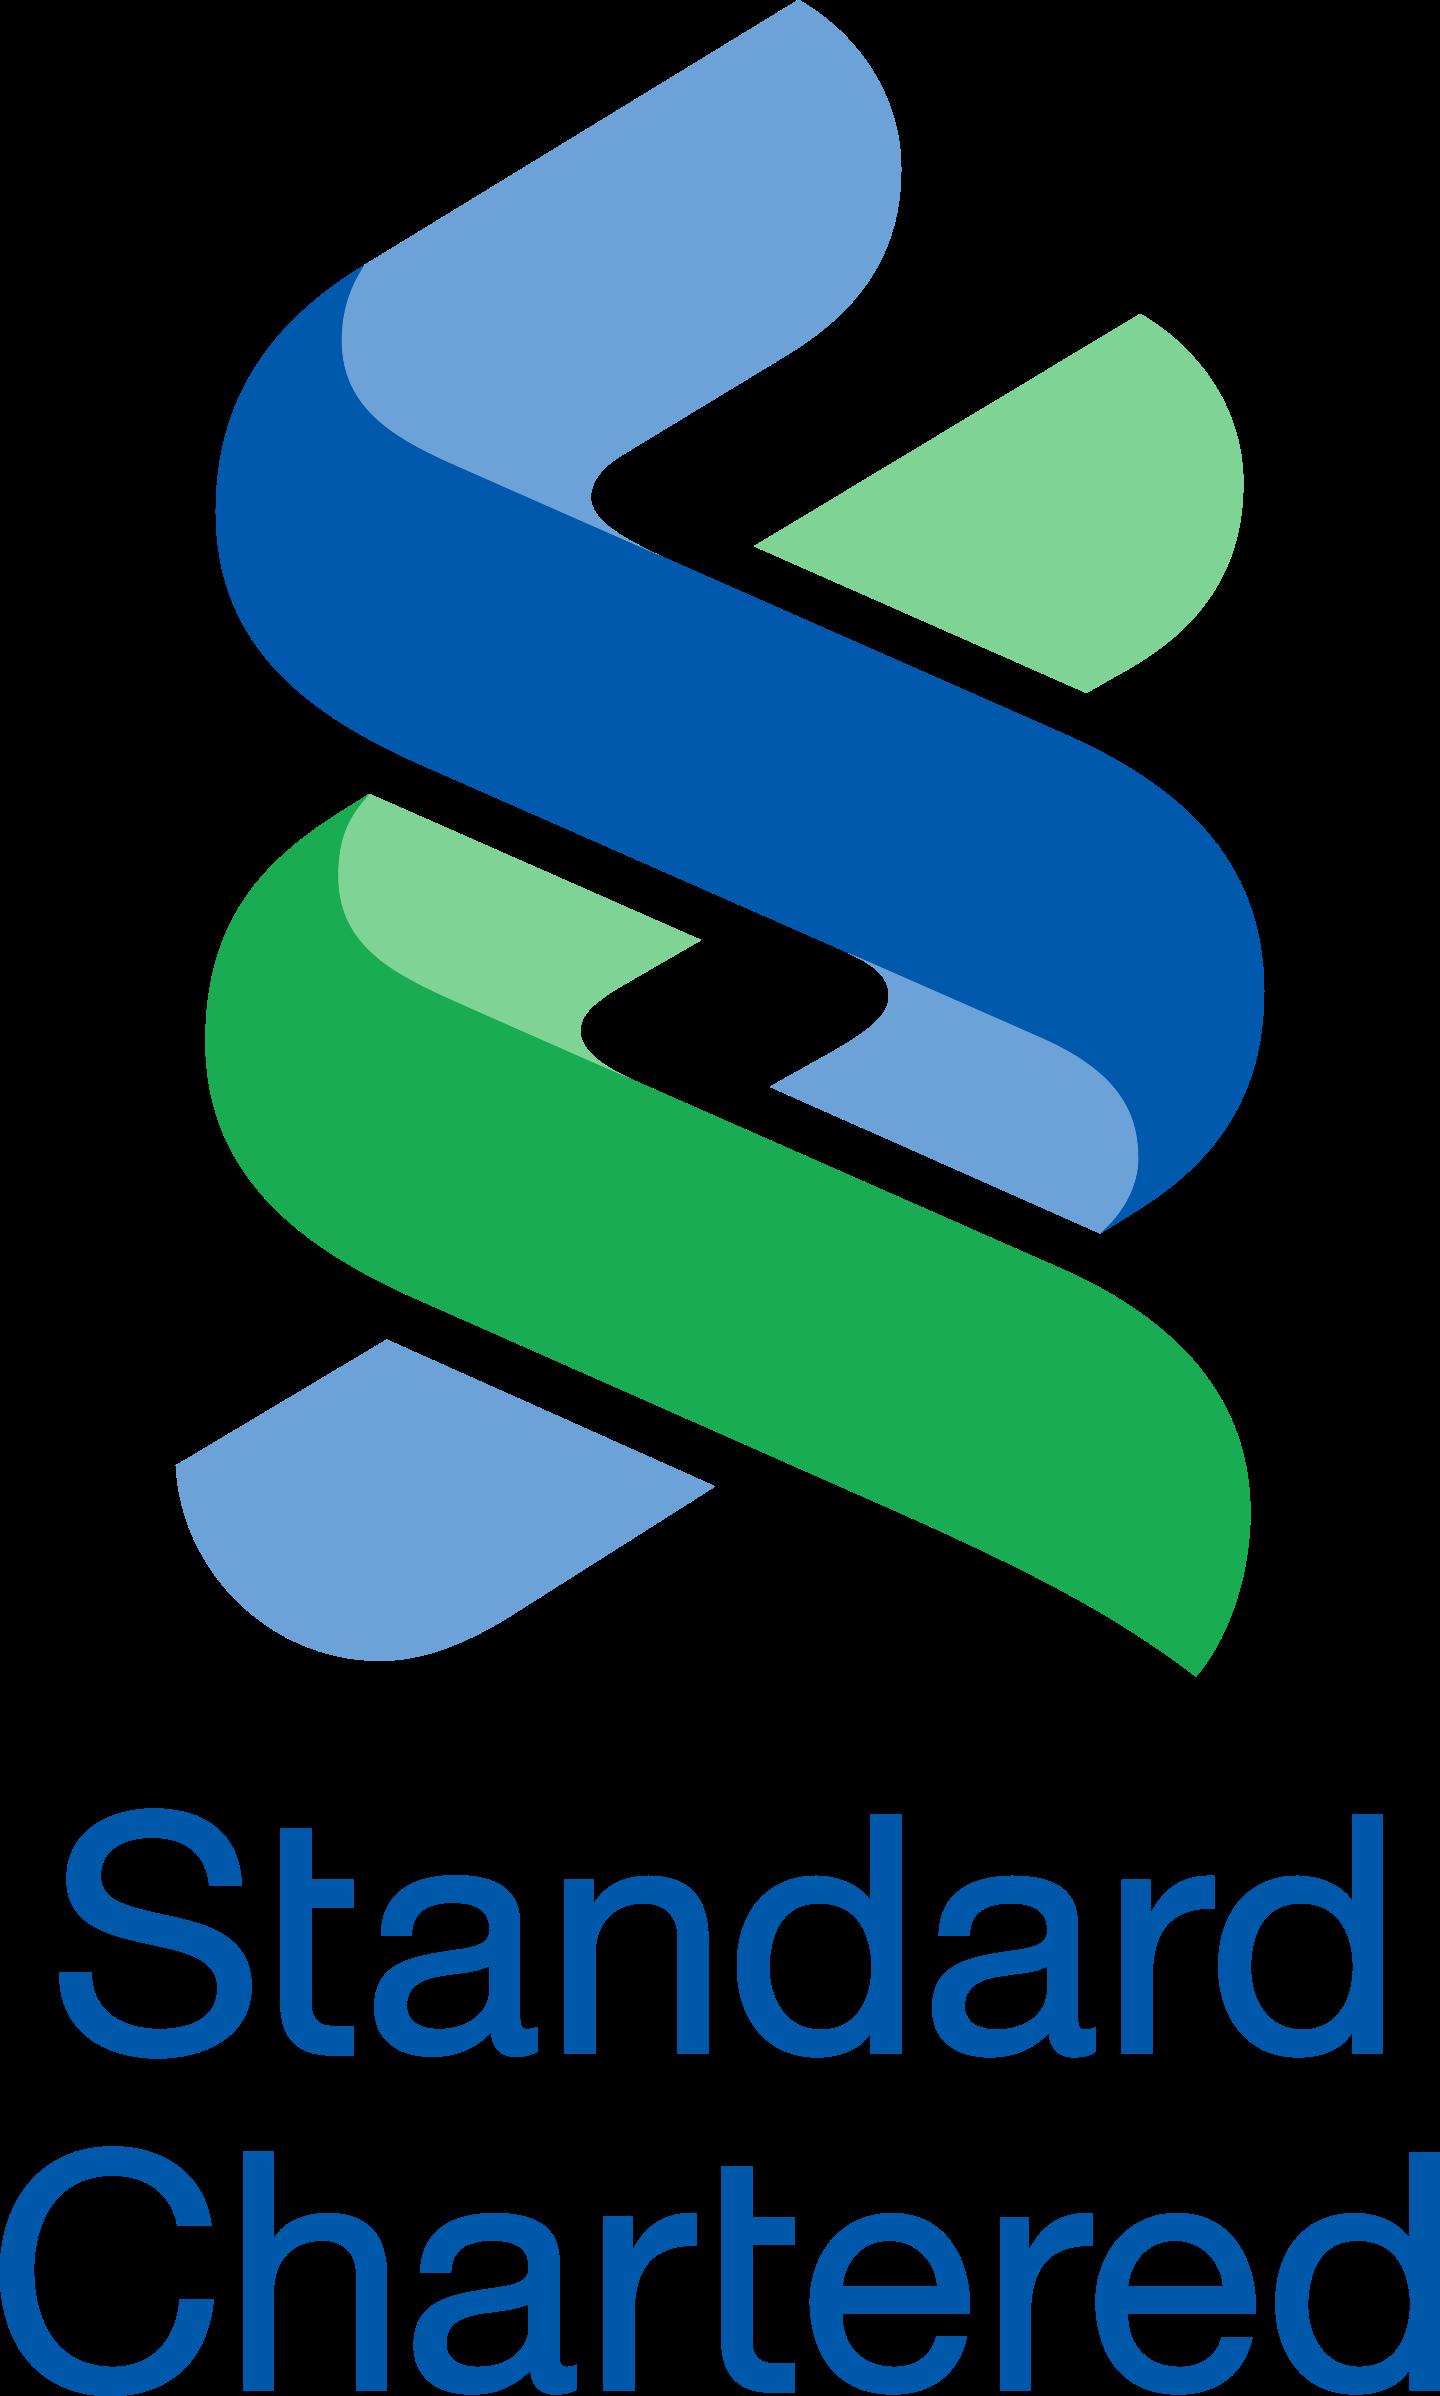 standard chartered logo 3 - Standard Chartered Logo